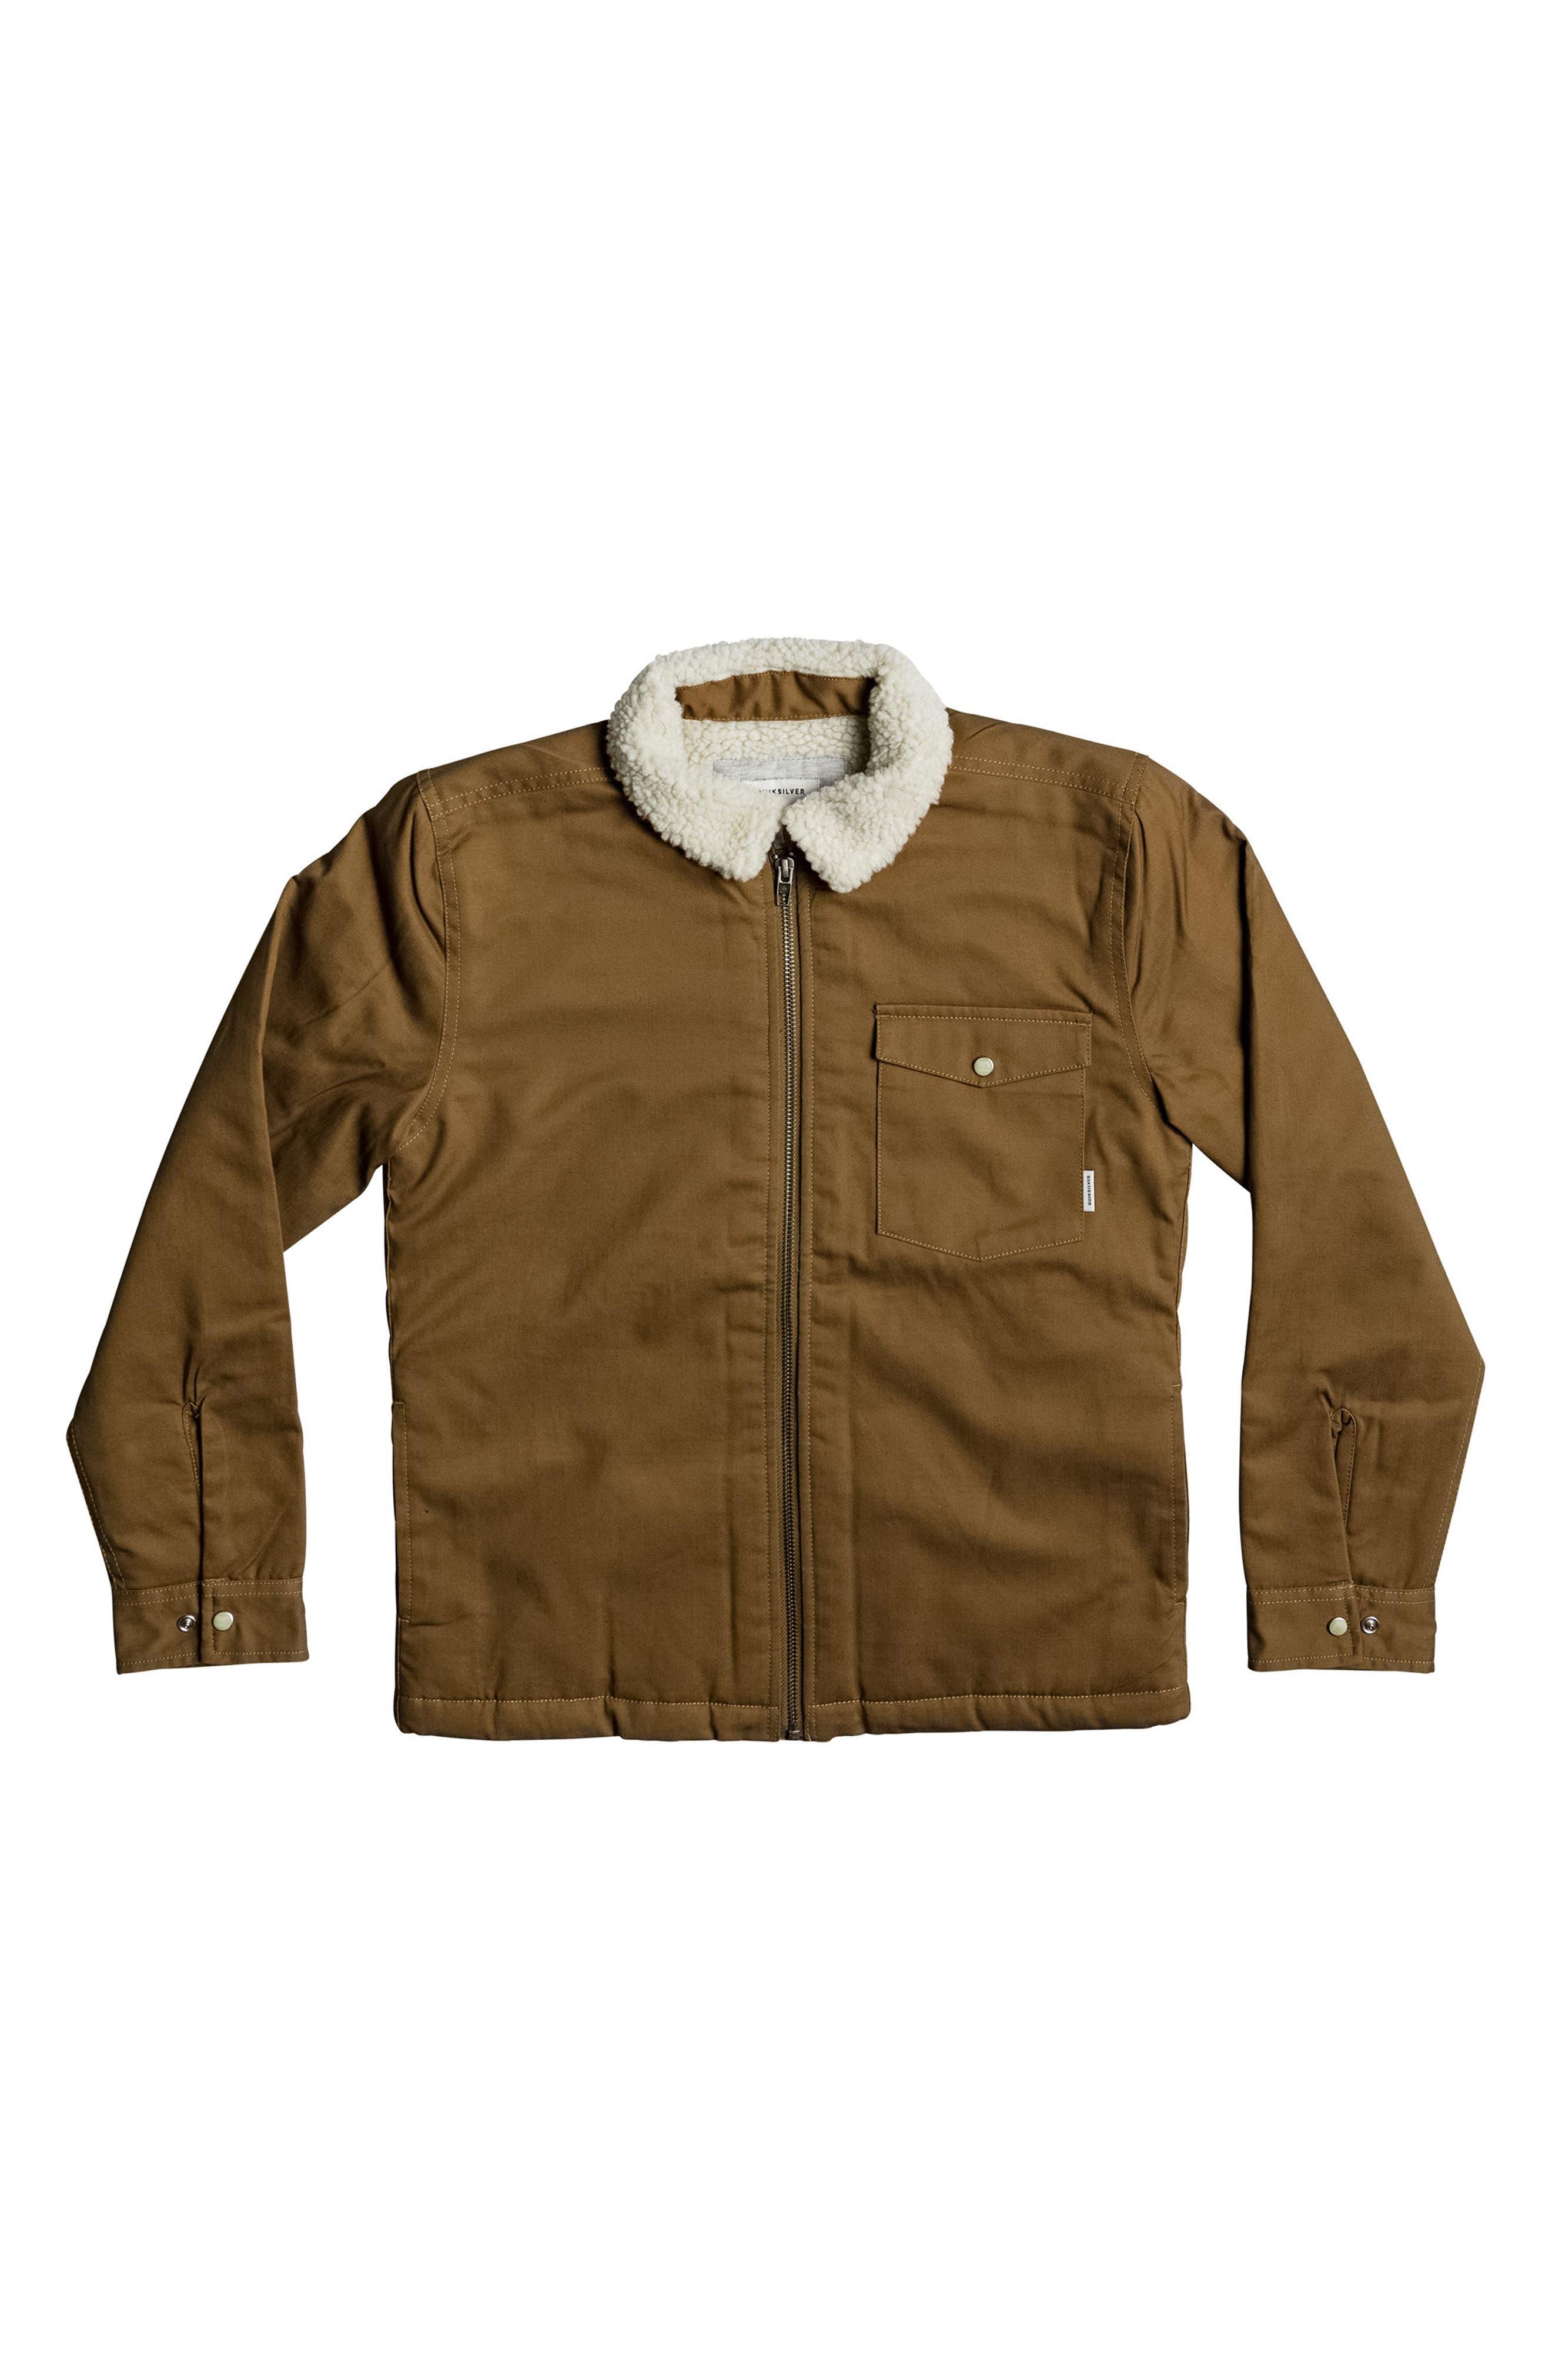 Dabein Fleece Lined Jacket,                         Main,                         color, 201